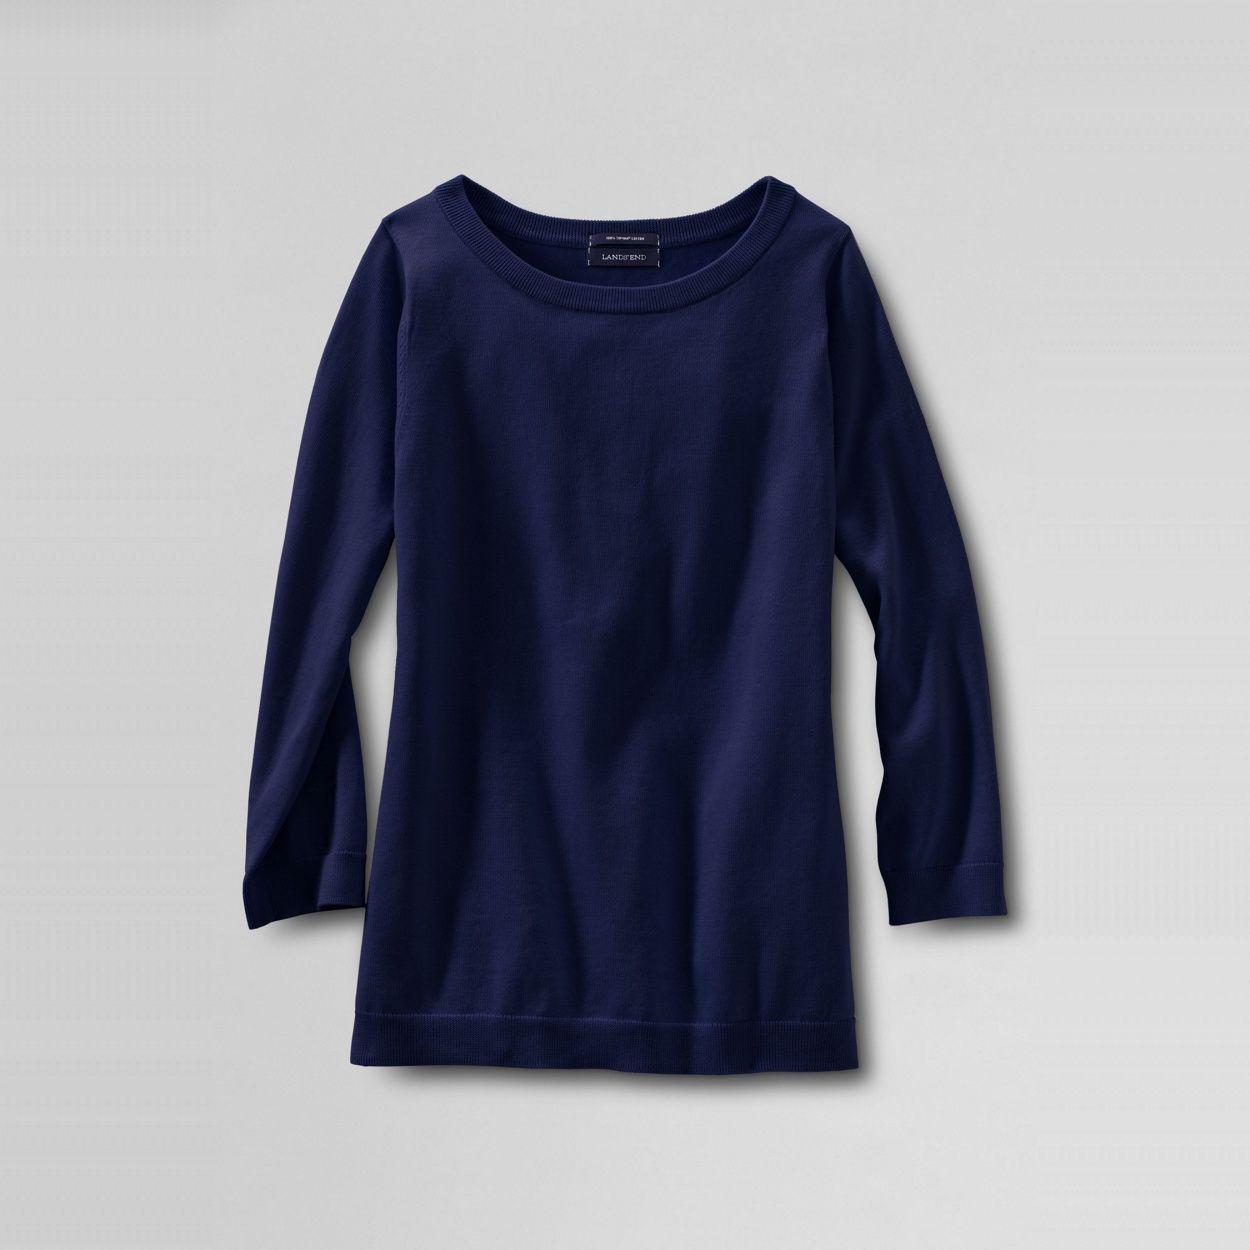 Lands' End Blue women's fine gauge supima® crew neck- at Debenhams.com